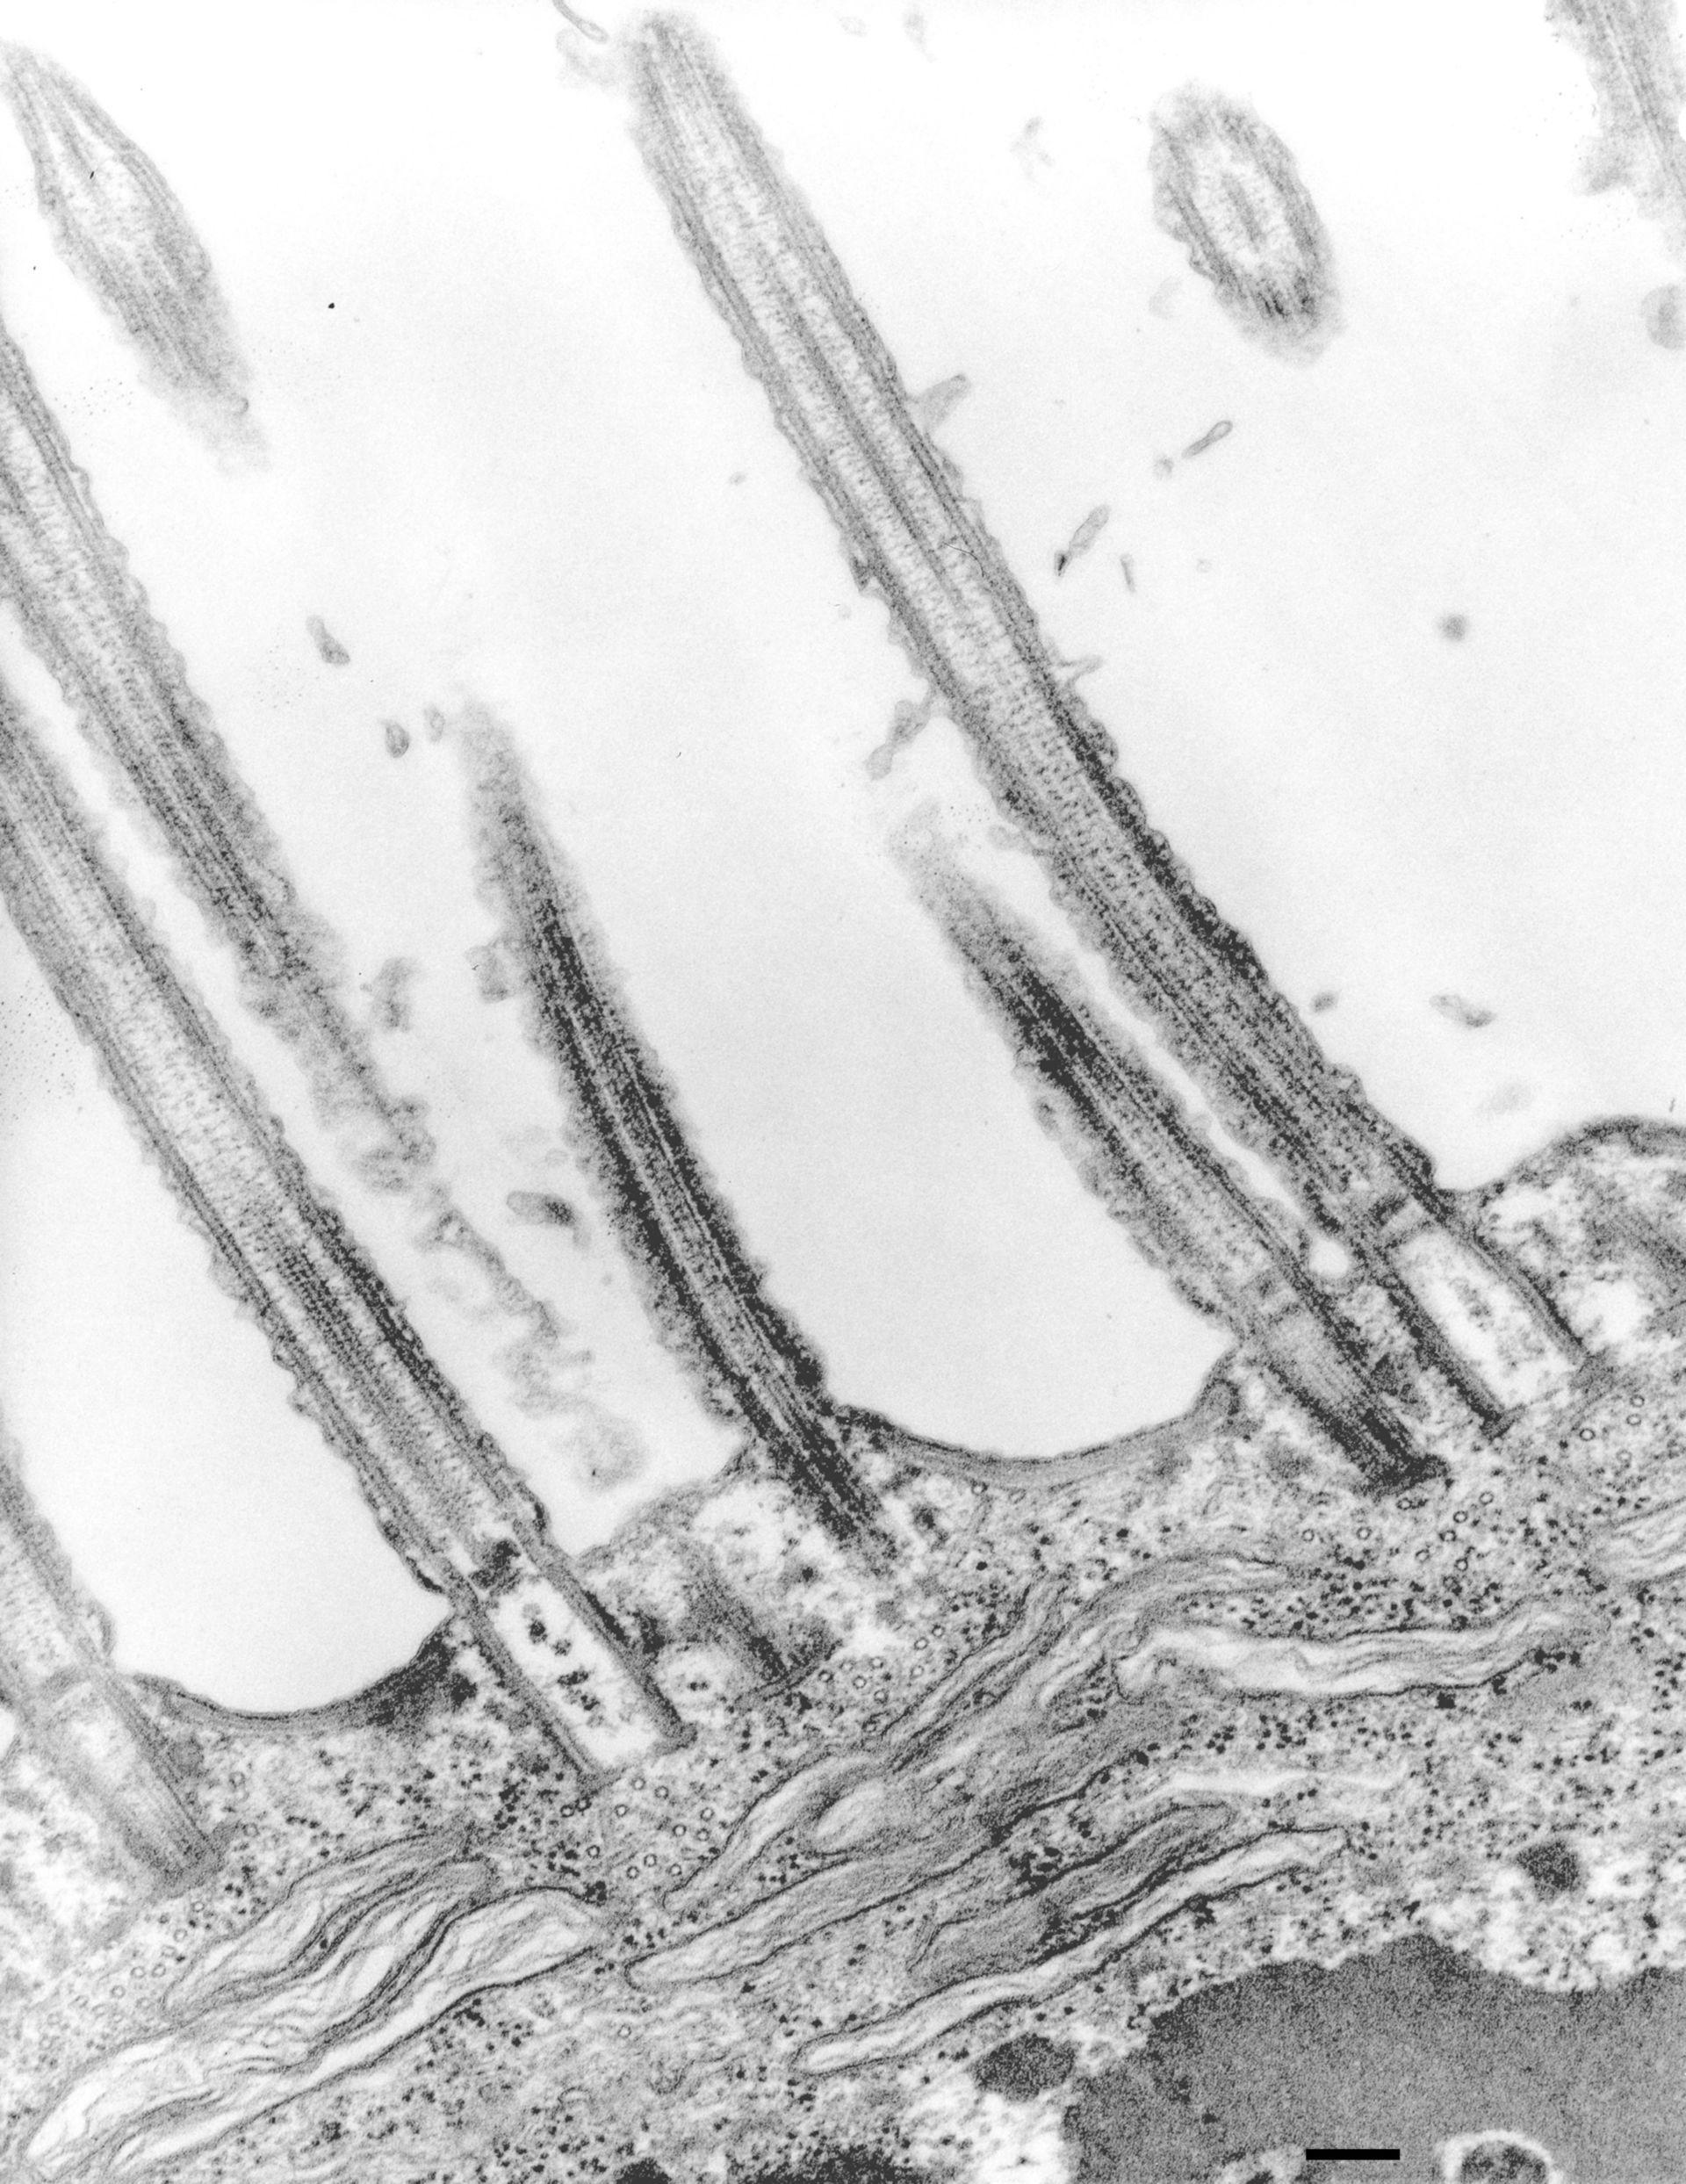 Euplotes sp. (corpo basale microtubuli) - CIL:12342